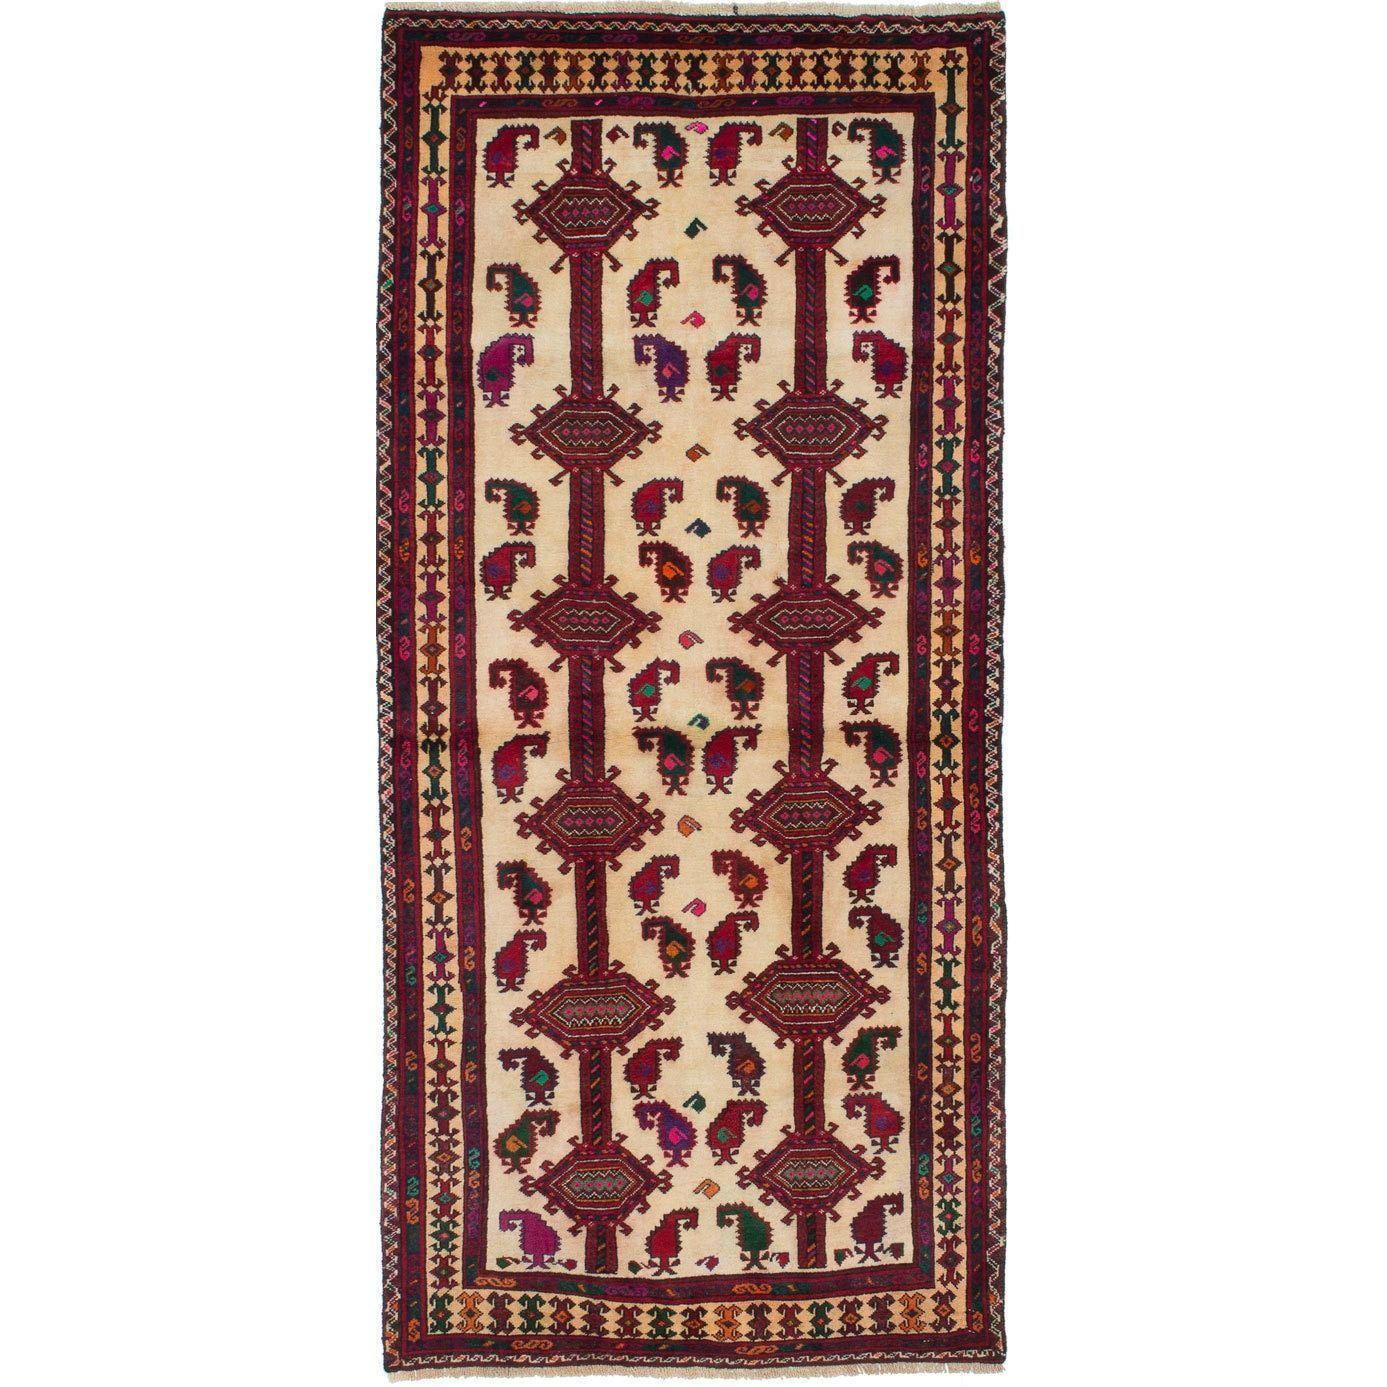 ecarpetgallery Hand-Knotted Finest Baluch Blue Wool Rug (3'0 x 6'8) (Blue Cream Rug (3' x 6'))